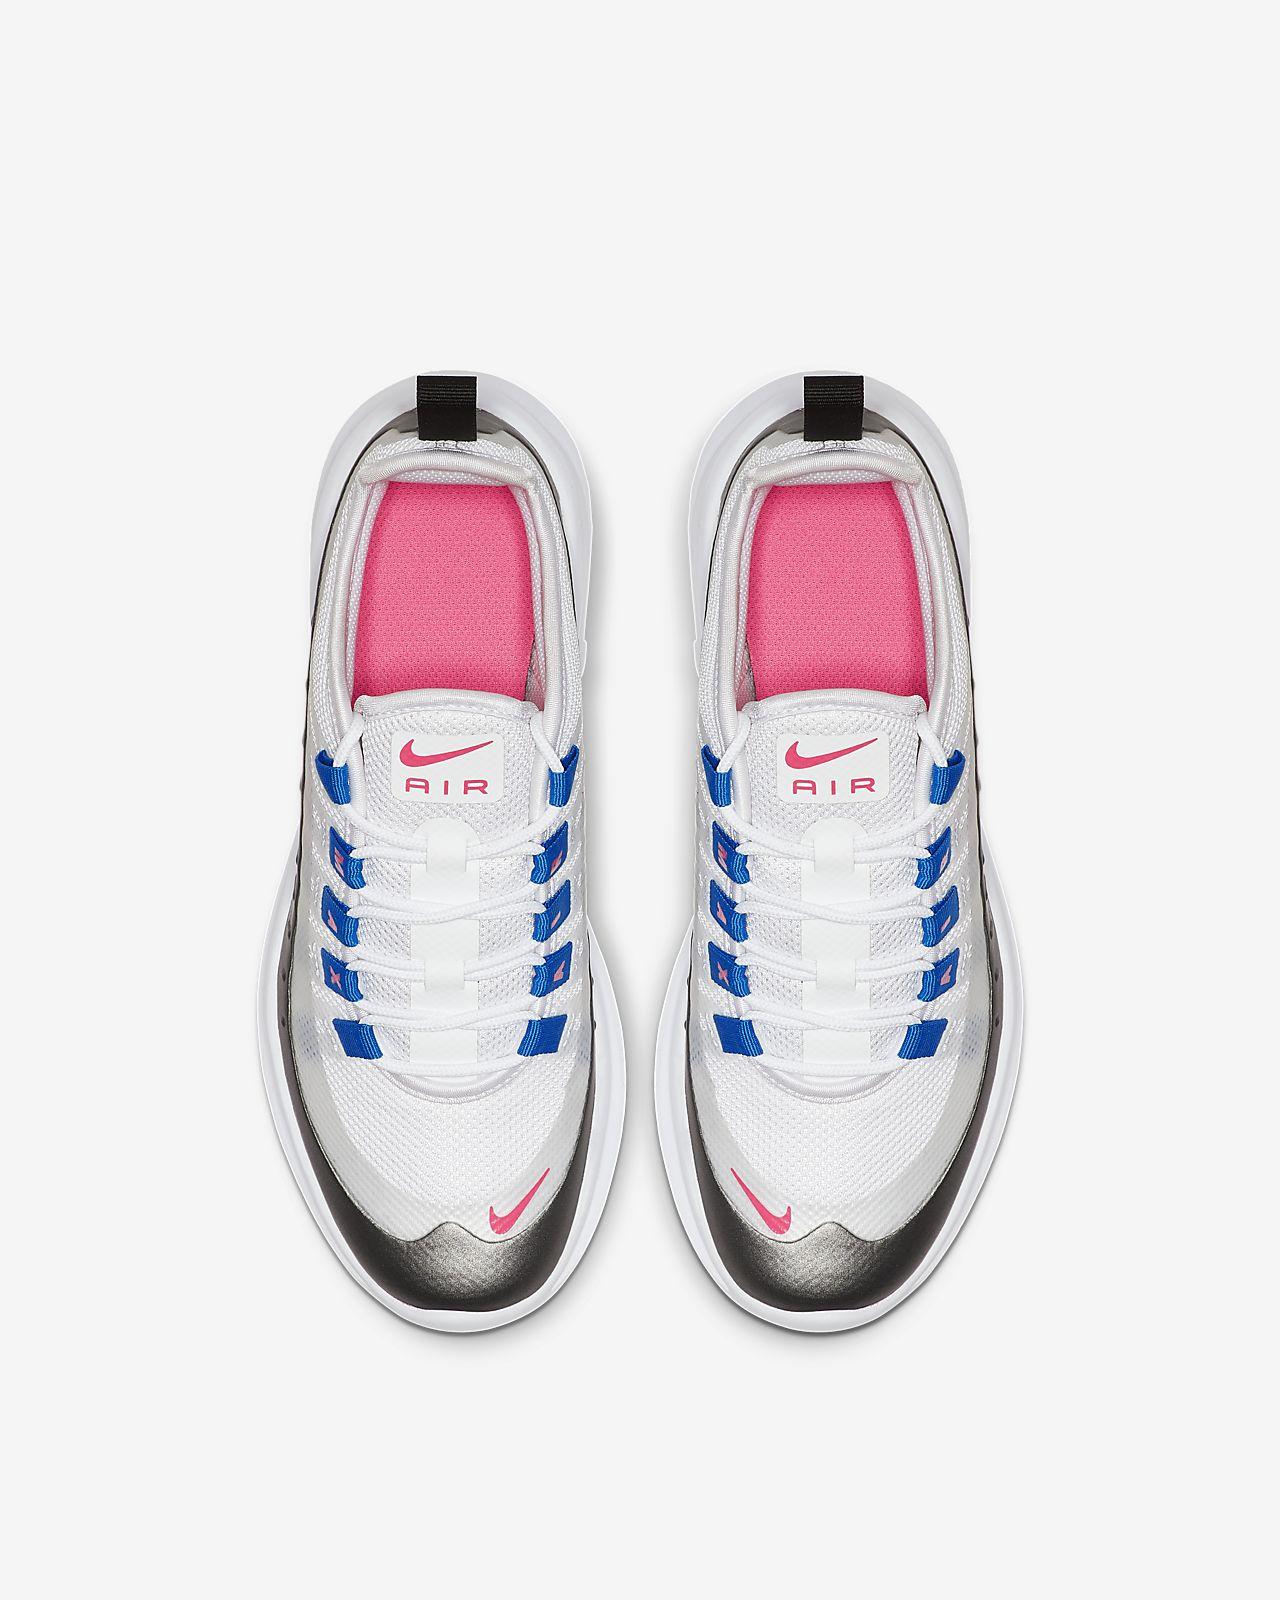 Axis Air Shoe Nike Max Older Kids' kiTlOXZuwP